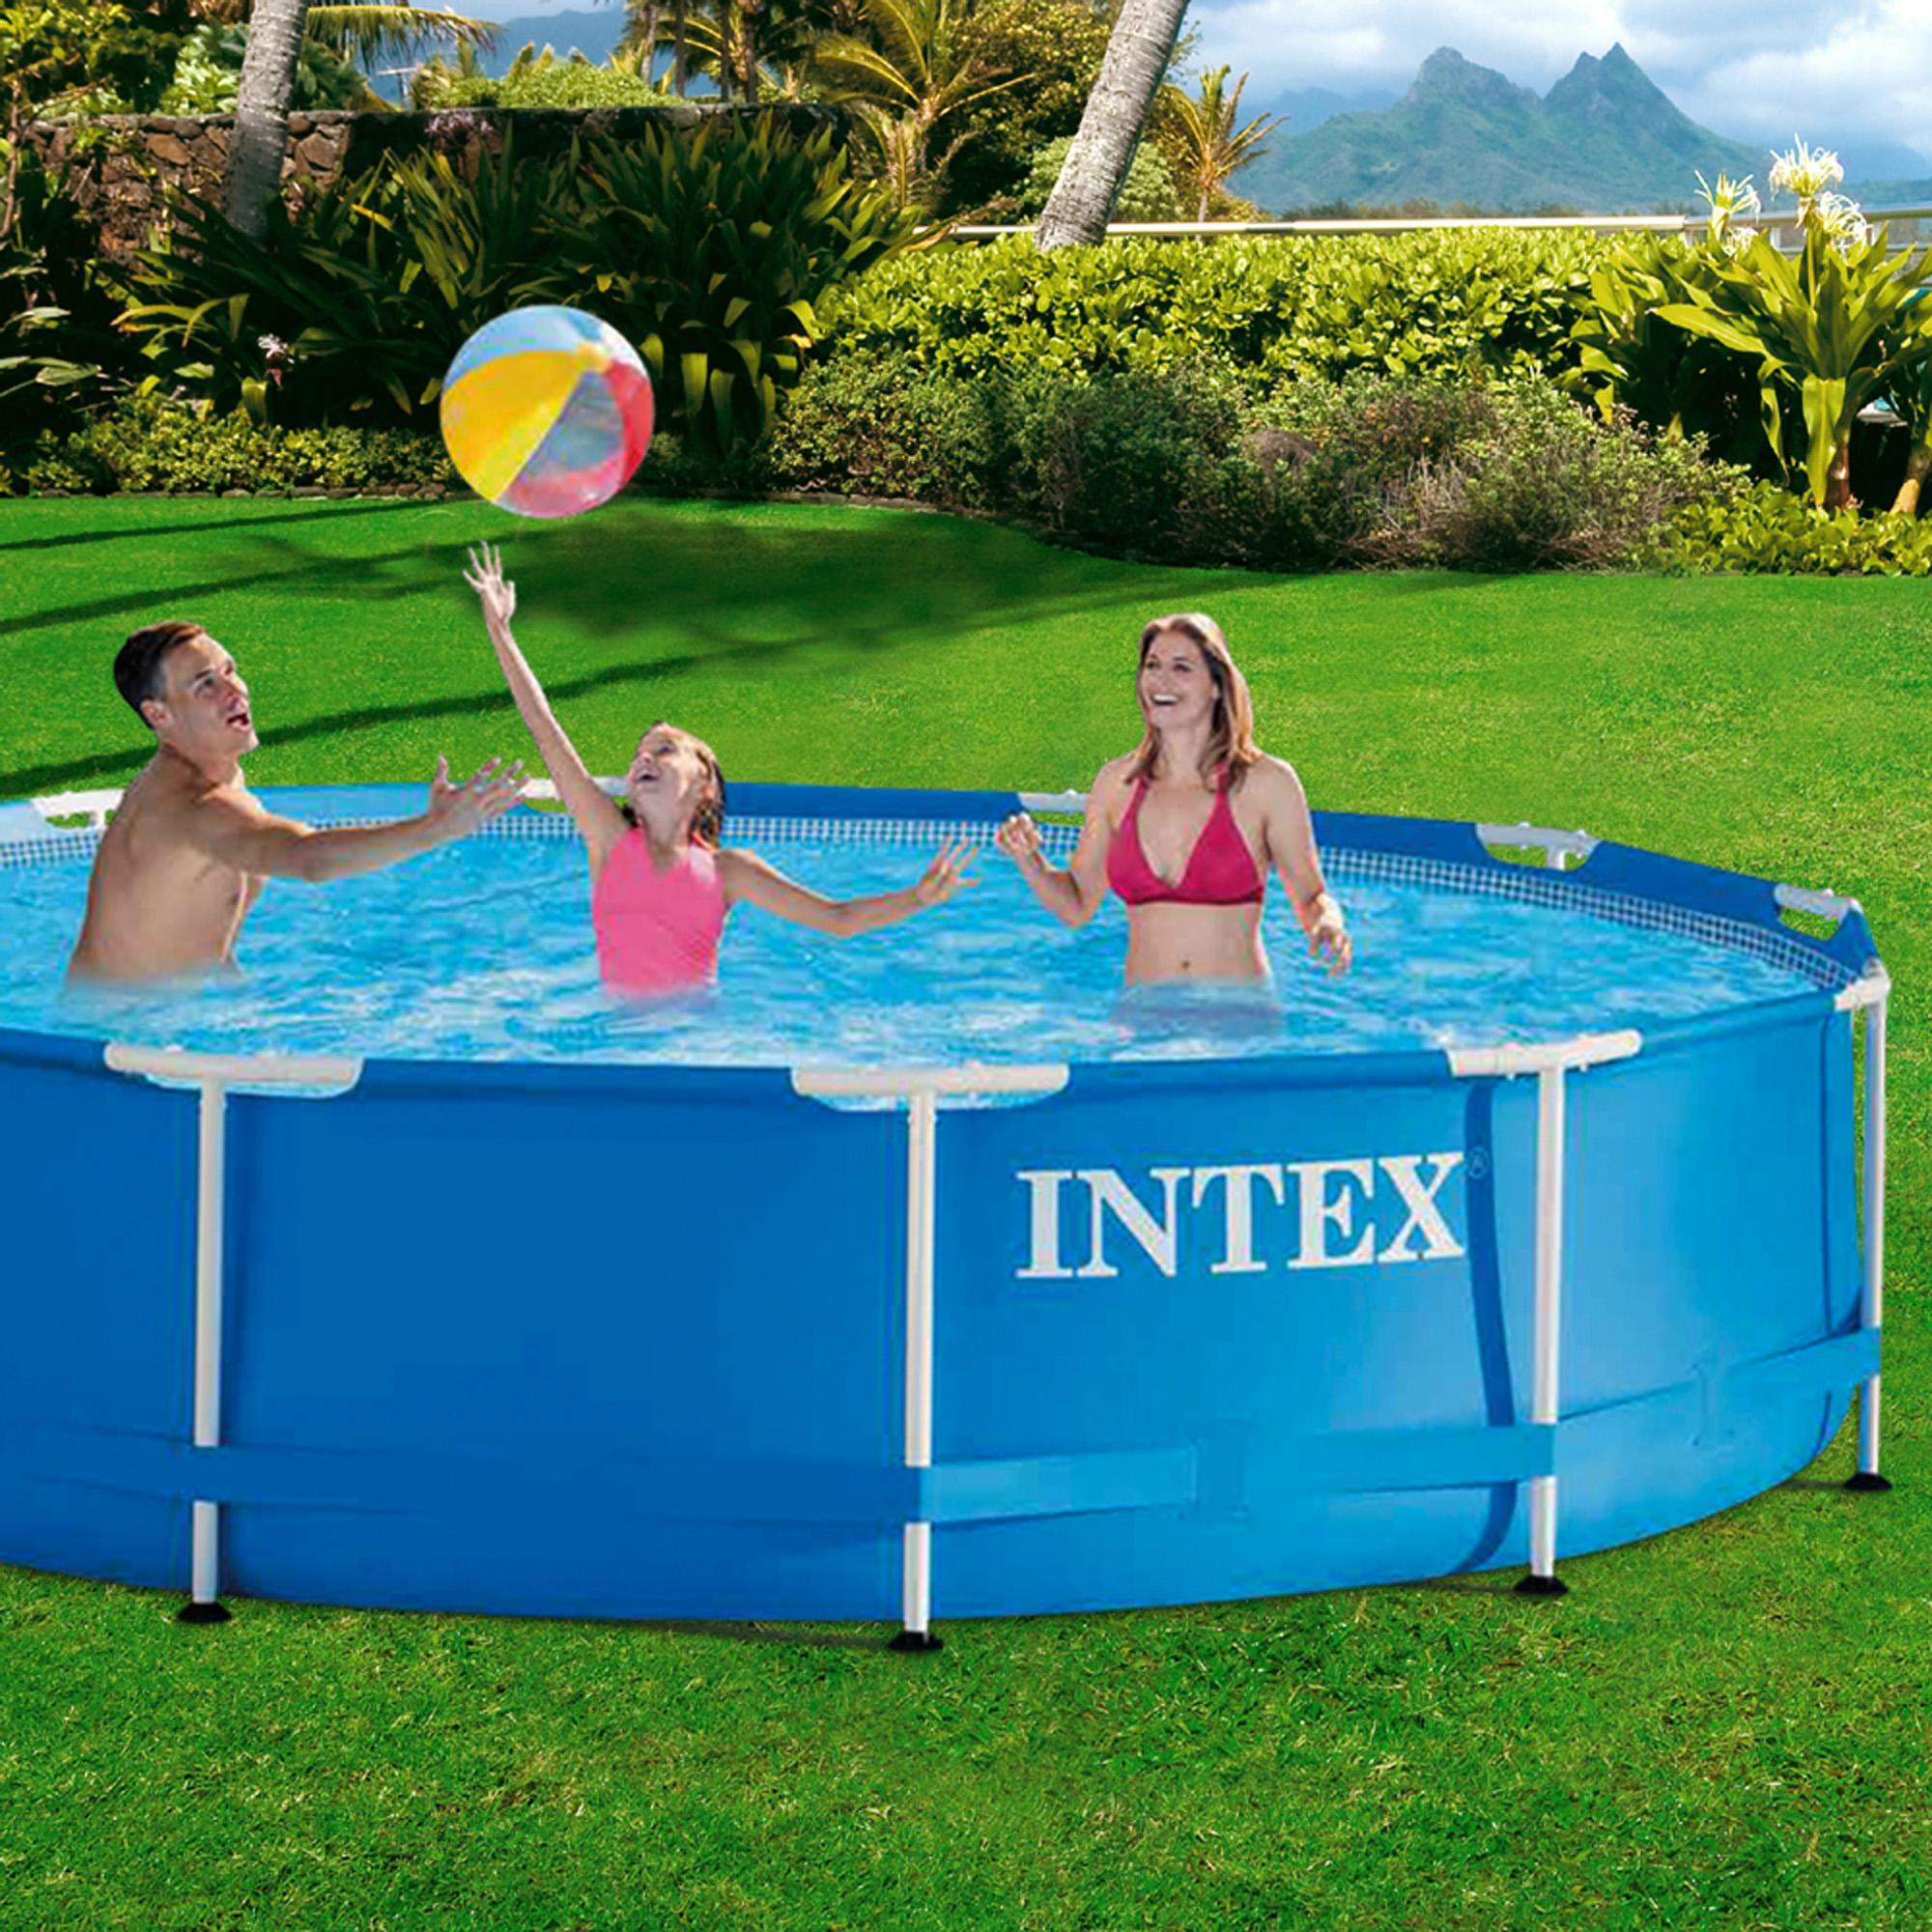 Intex Grande Piscine Tubulaire Intex 366x76 Decathlon